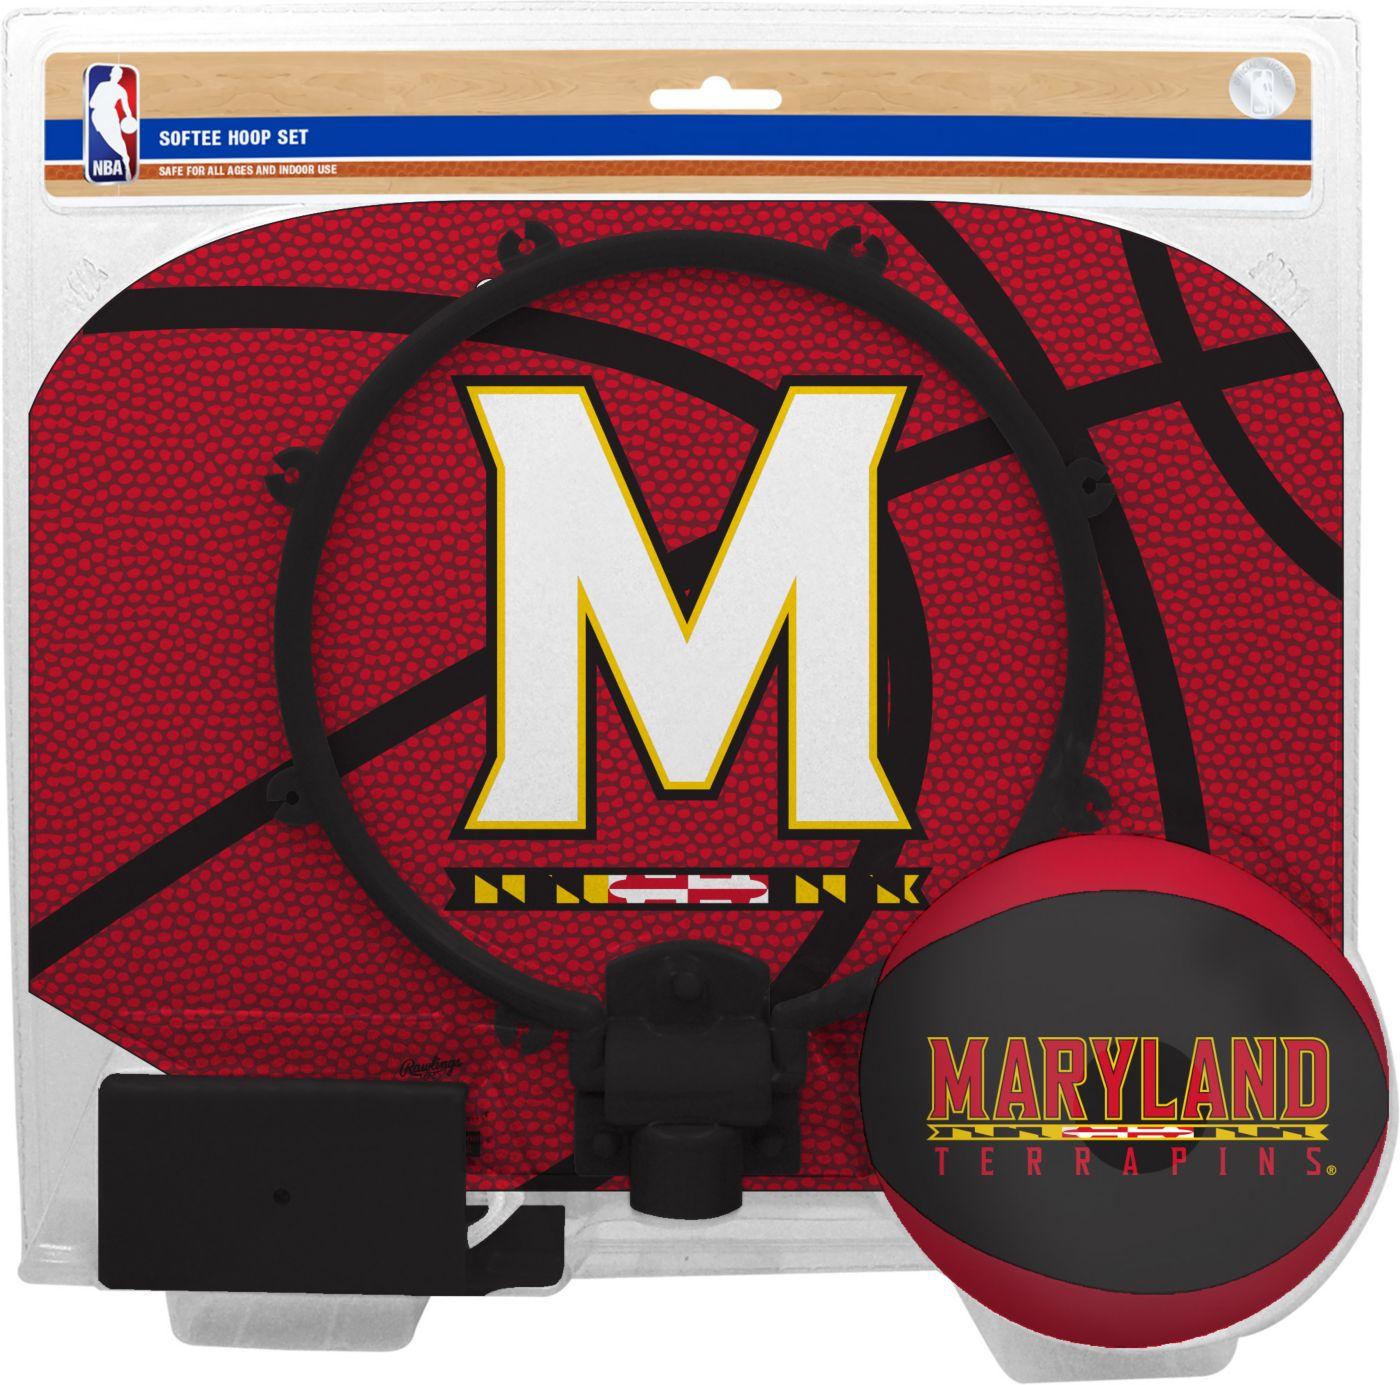 Rawlings Maryland Terrapins Slam Dunk Softee Hoop Set